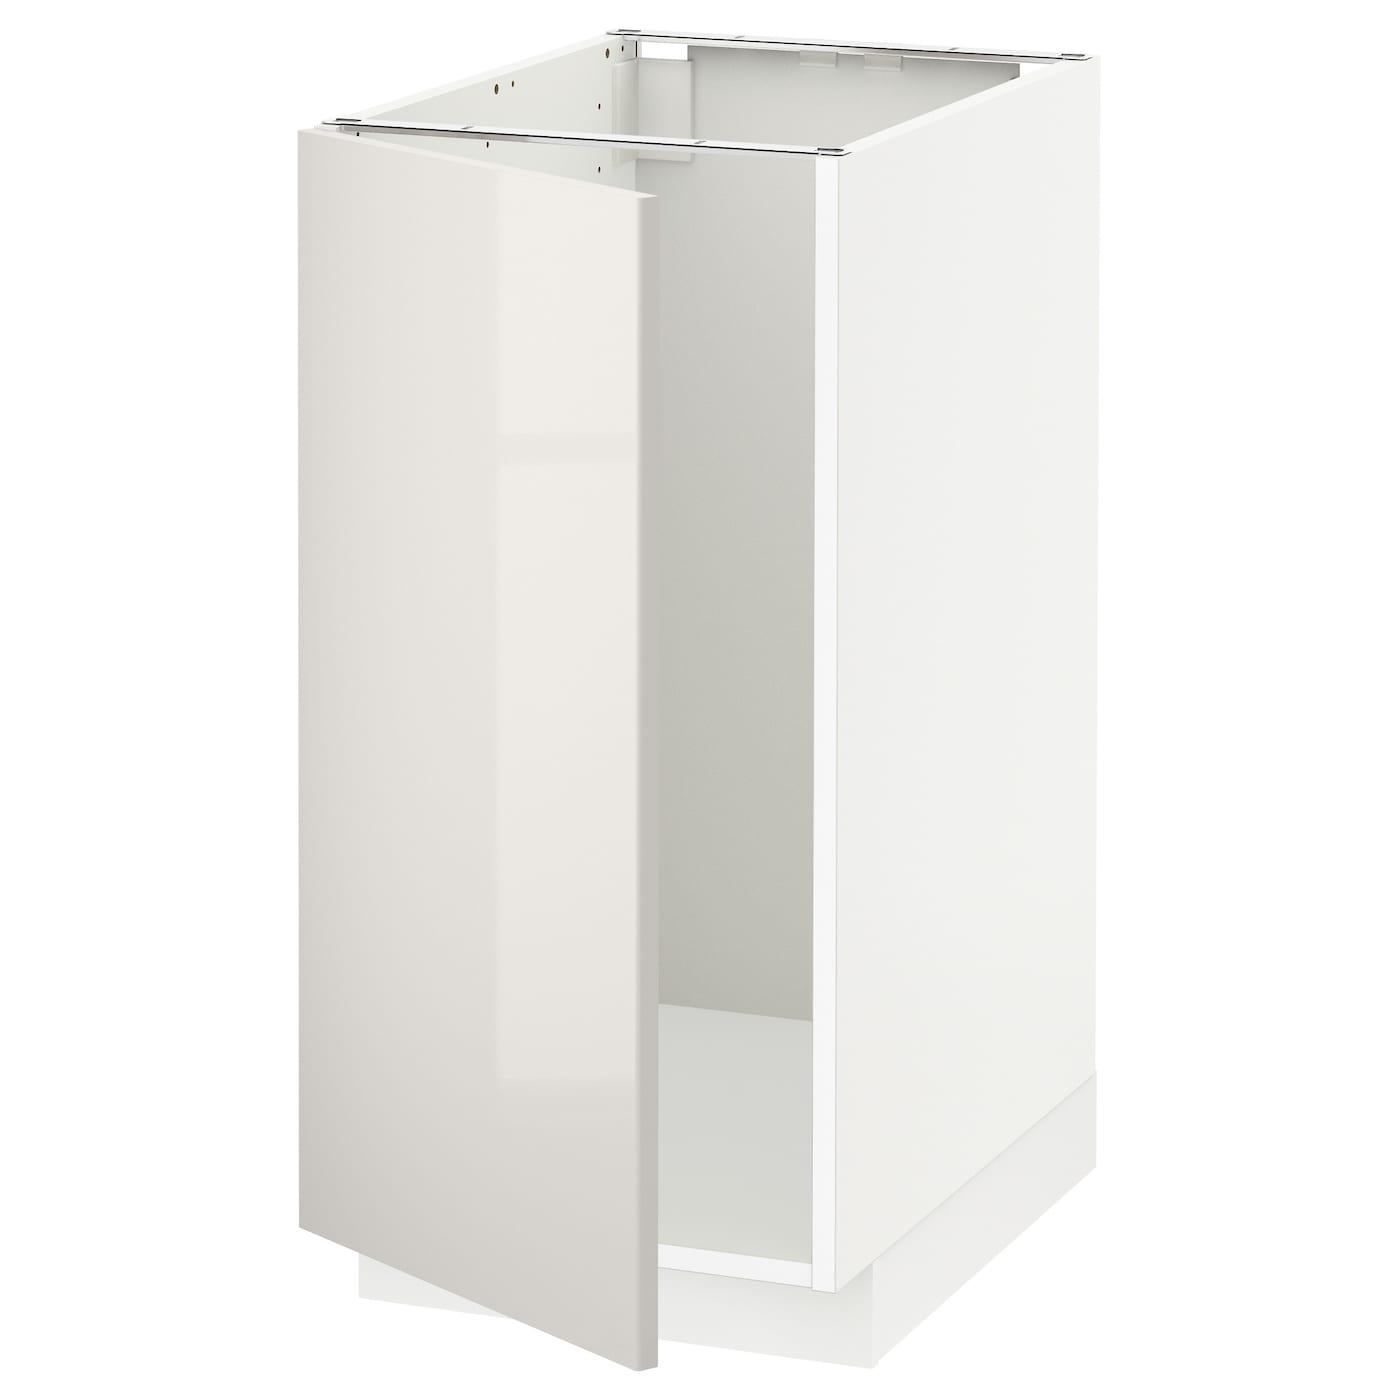 Ringhult Grey Kitchen: METOD Base Cab F Sink/waste Sorting White/ringhult Light